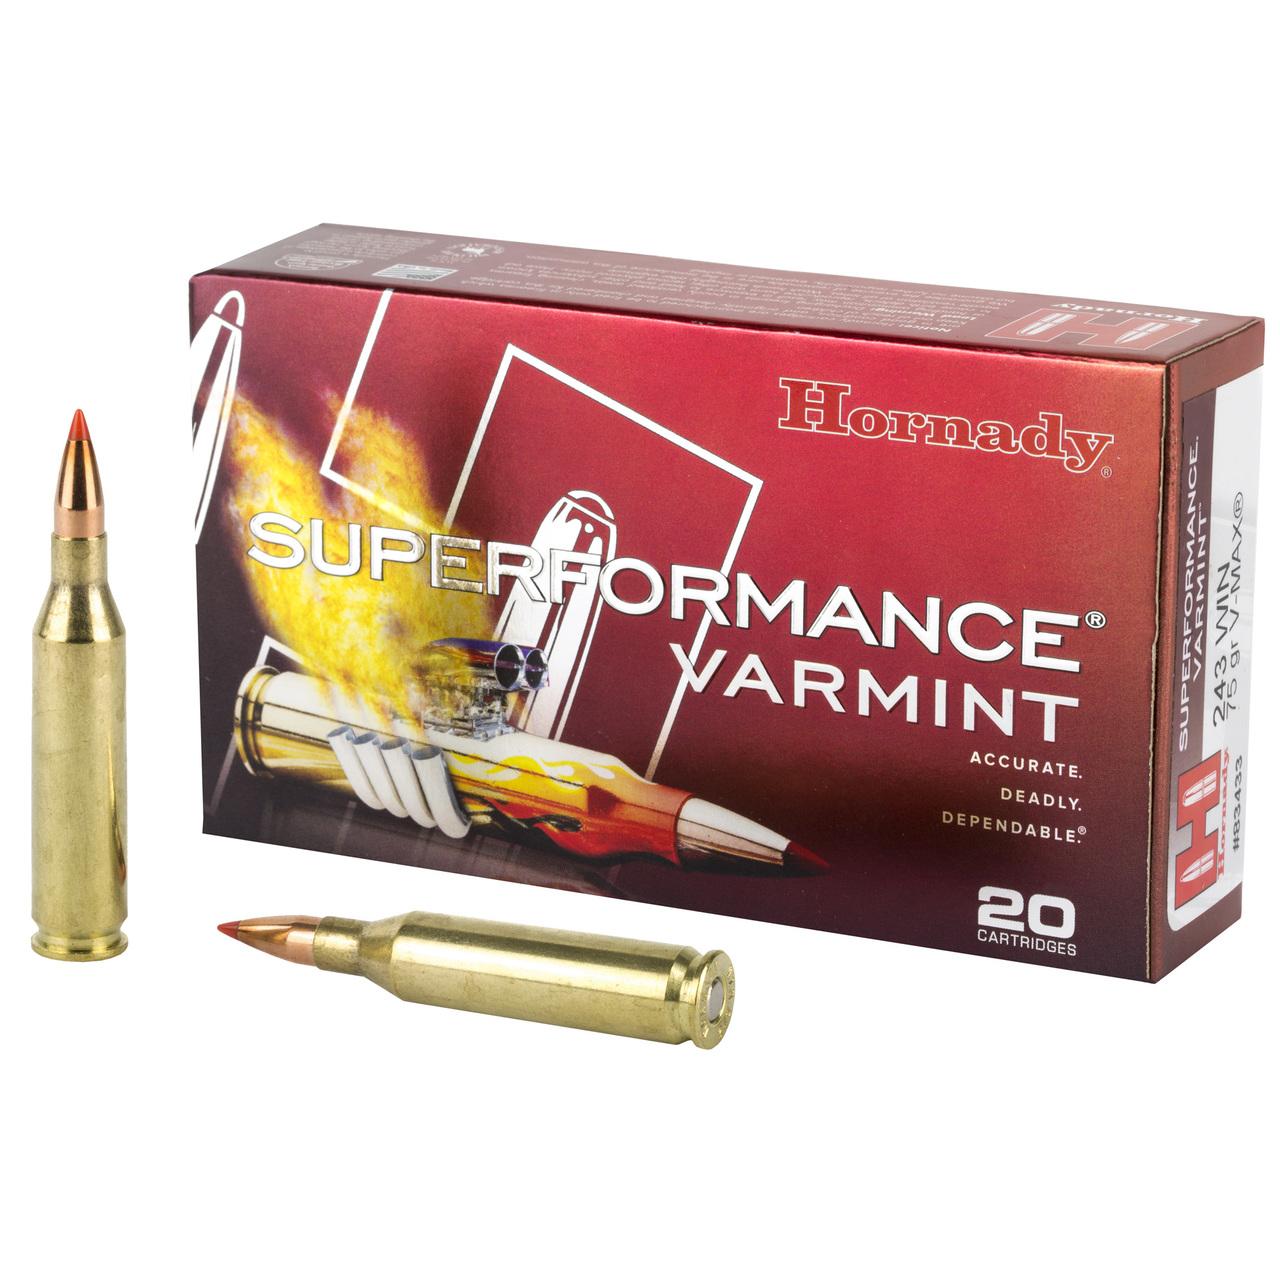 Ammo - Rifle Ammo -  243 Win - 2A Warehouse